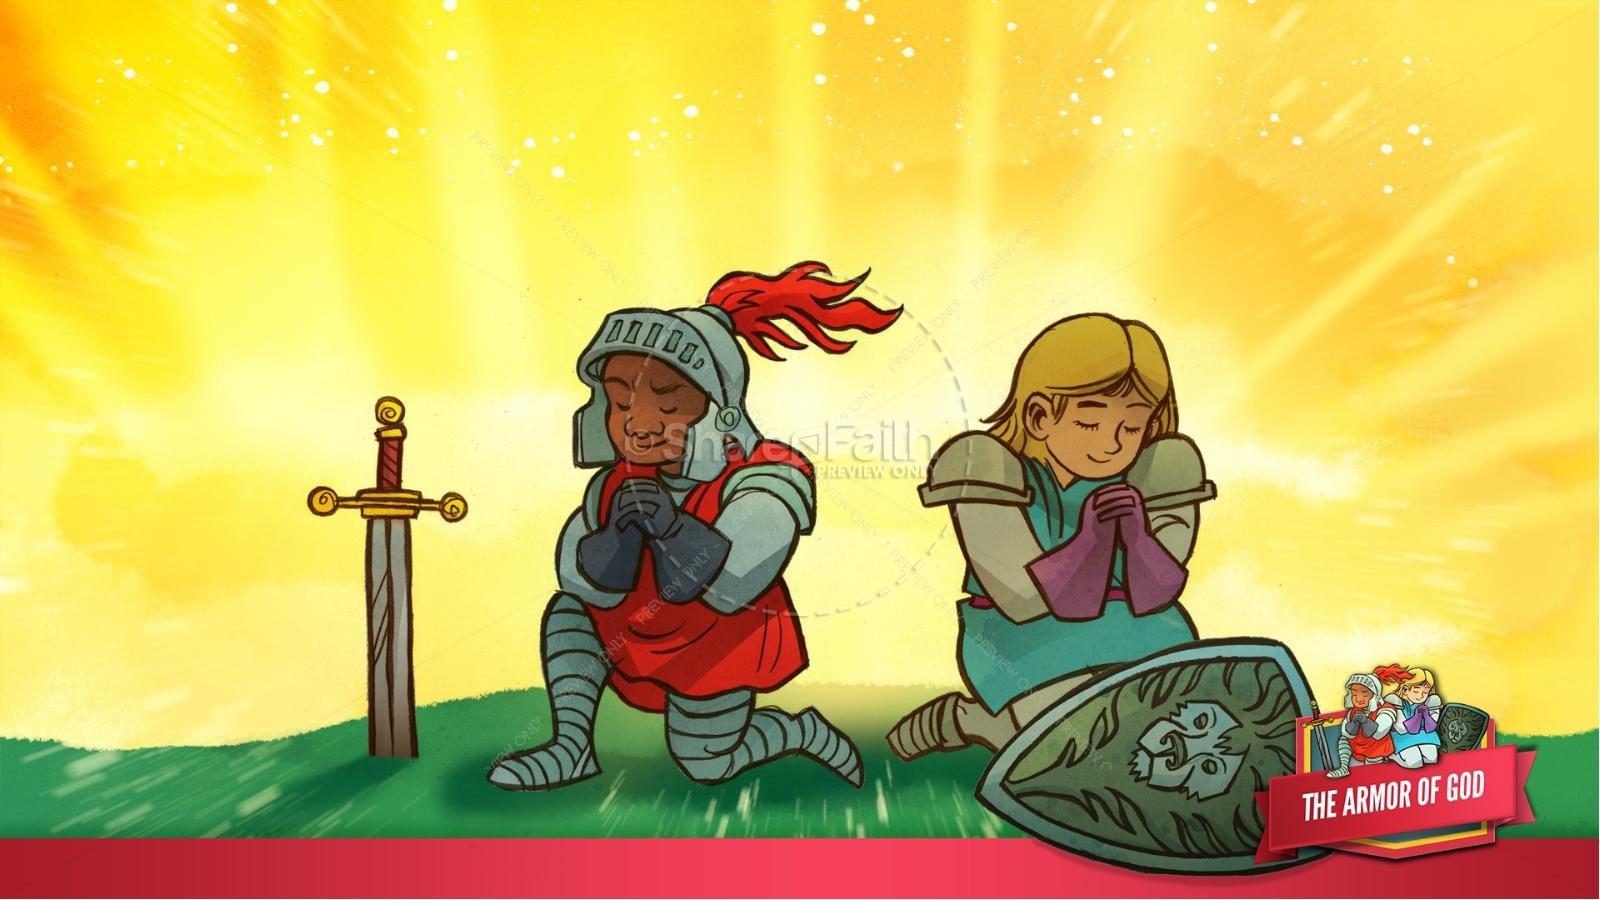 Ephesians 6 The Armor of God Kids Bible Story | slide 44